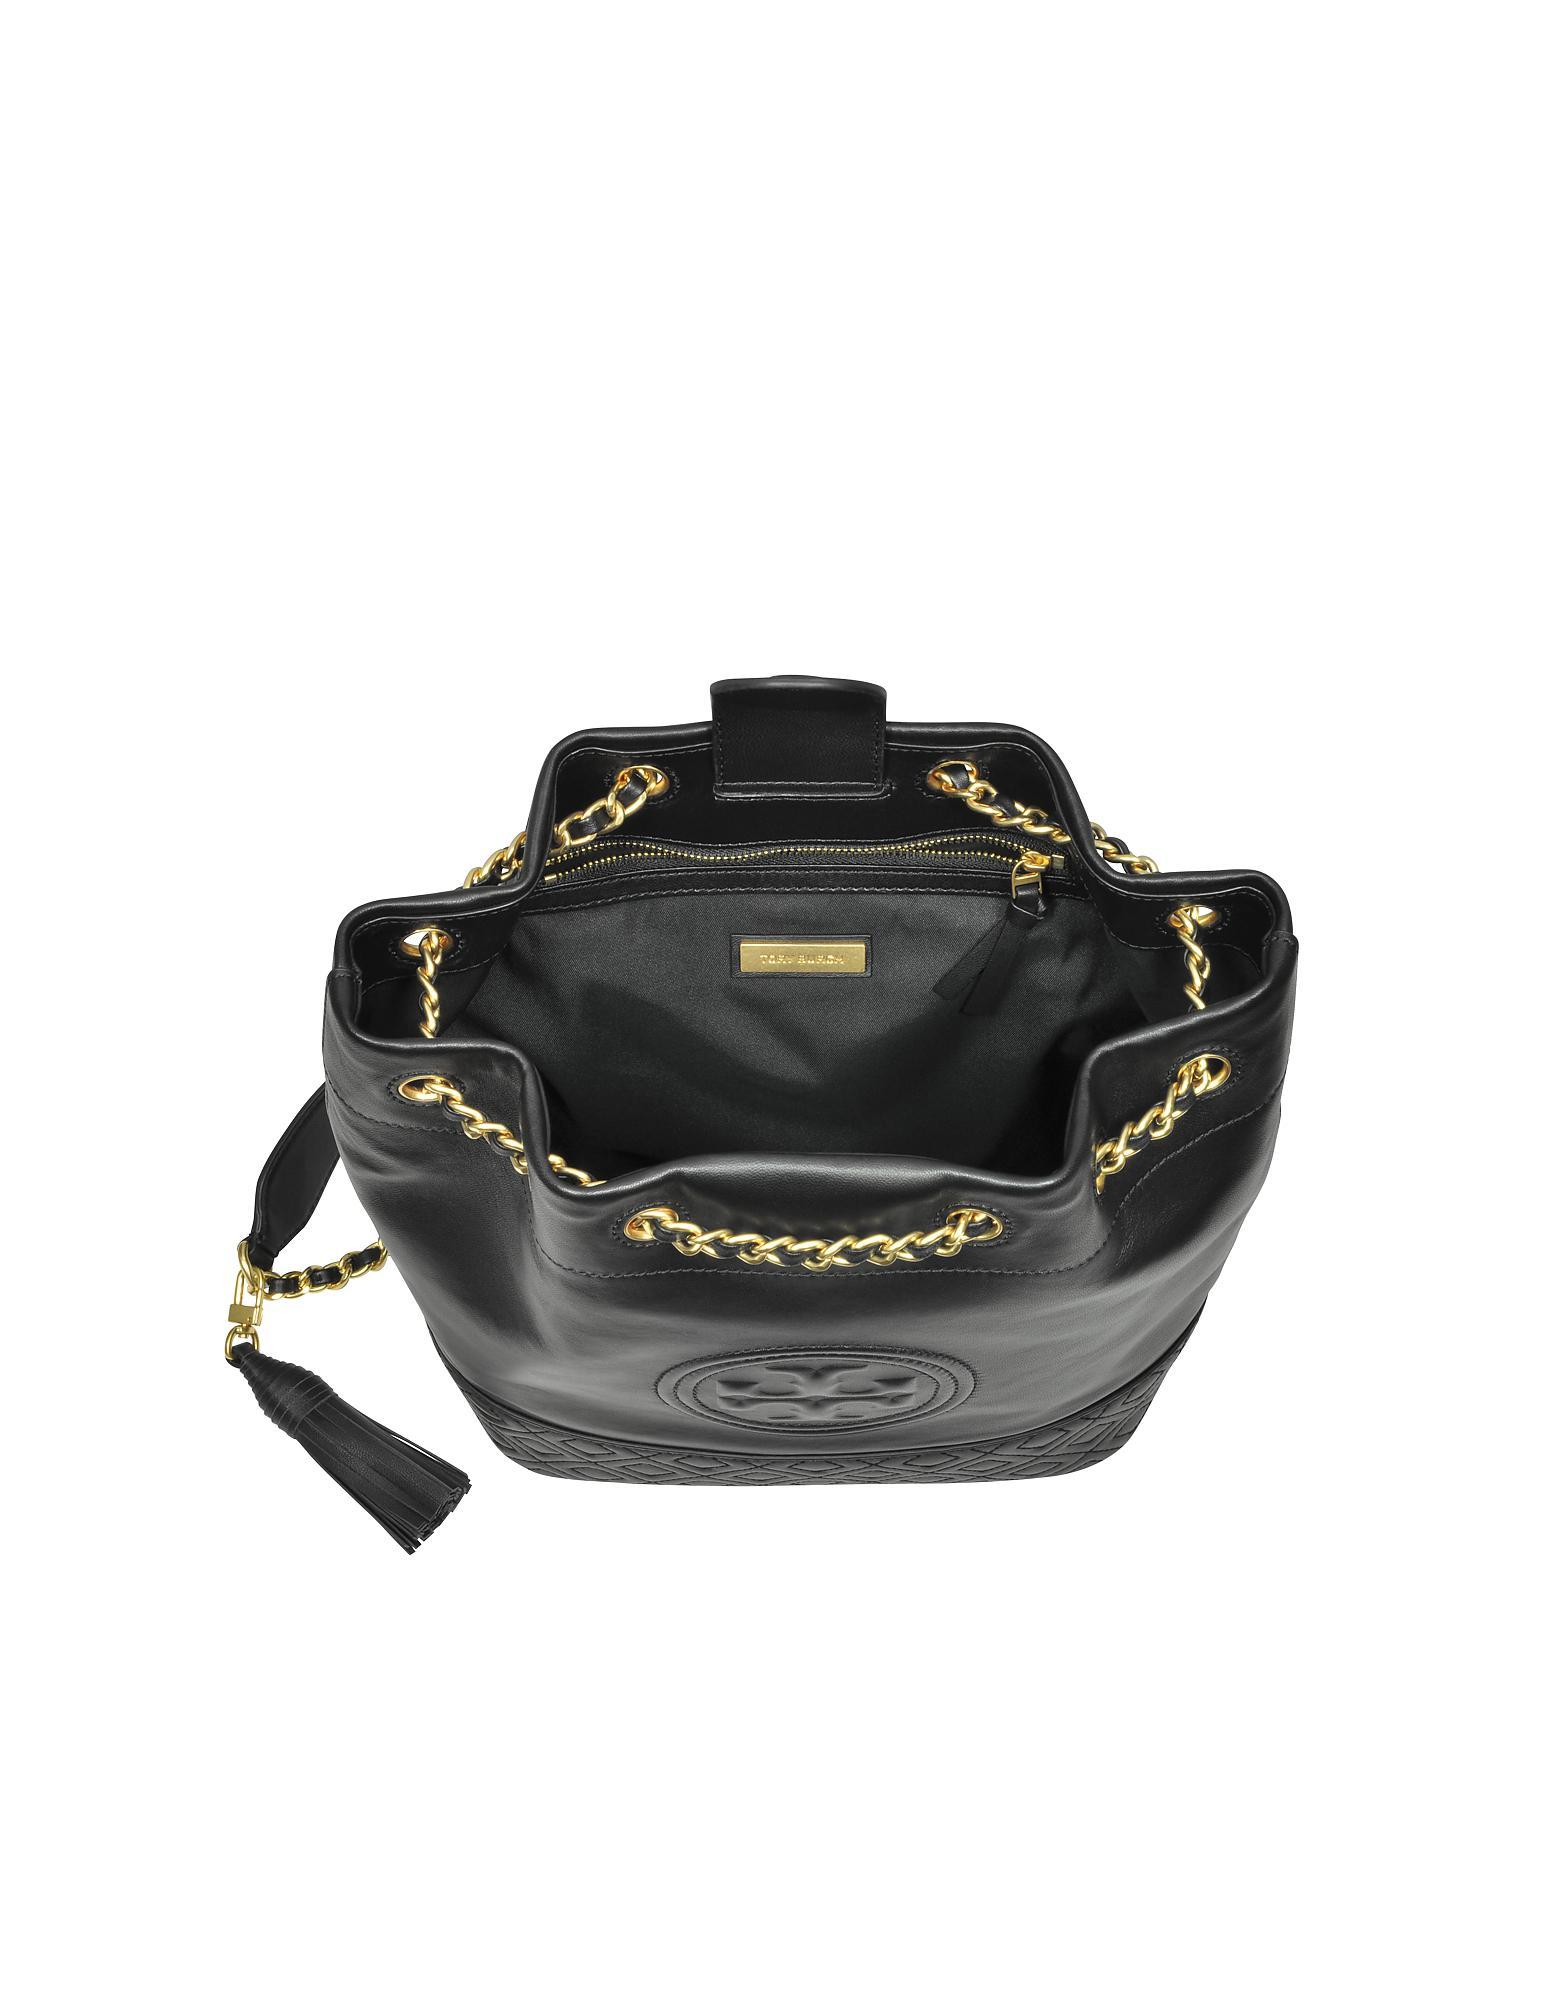 6646d9c9332b Lyst - Tory Burch Black Leather Fleming Bucket Bag in Black